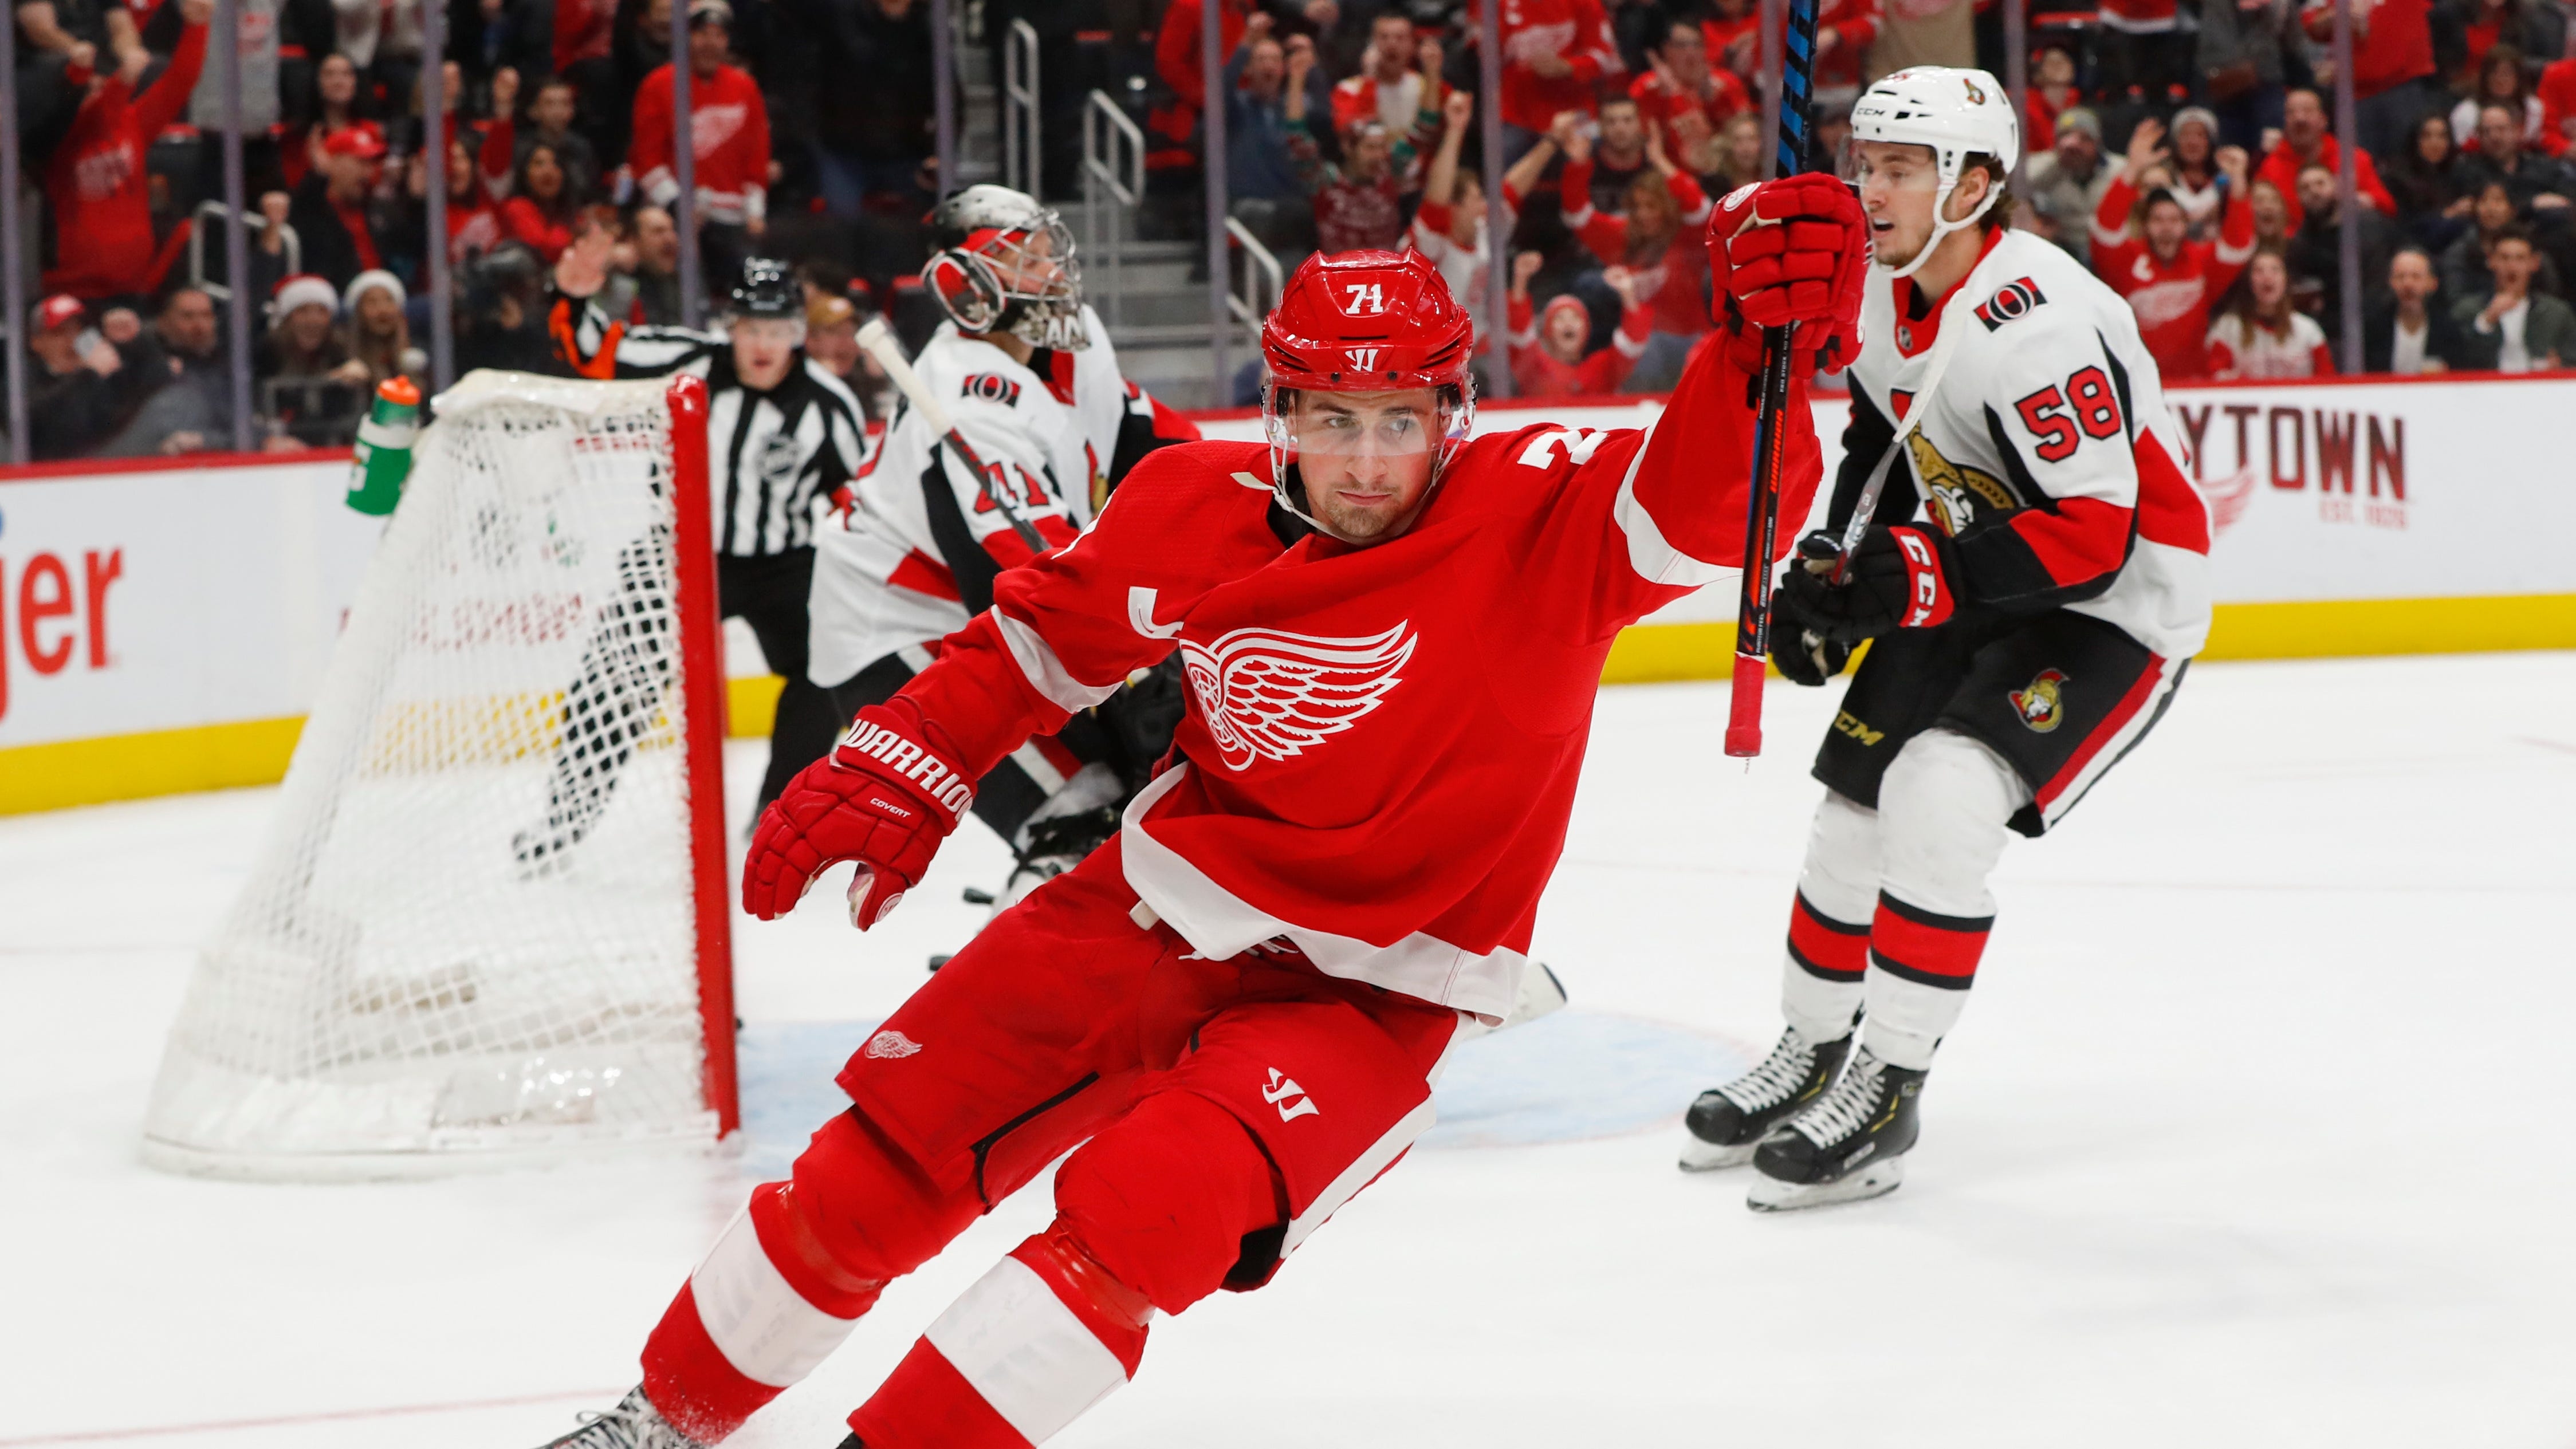 A0827c3b-be96-4073-aa3d-17e6435bf62f-ap_senators_red_wings_hockey